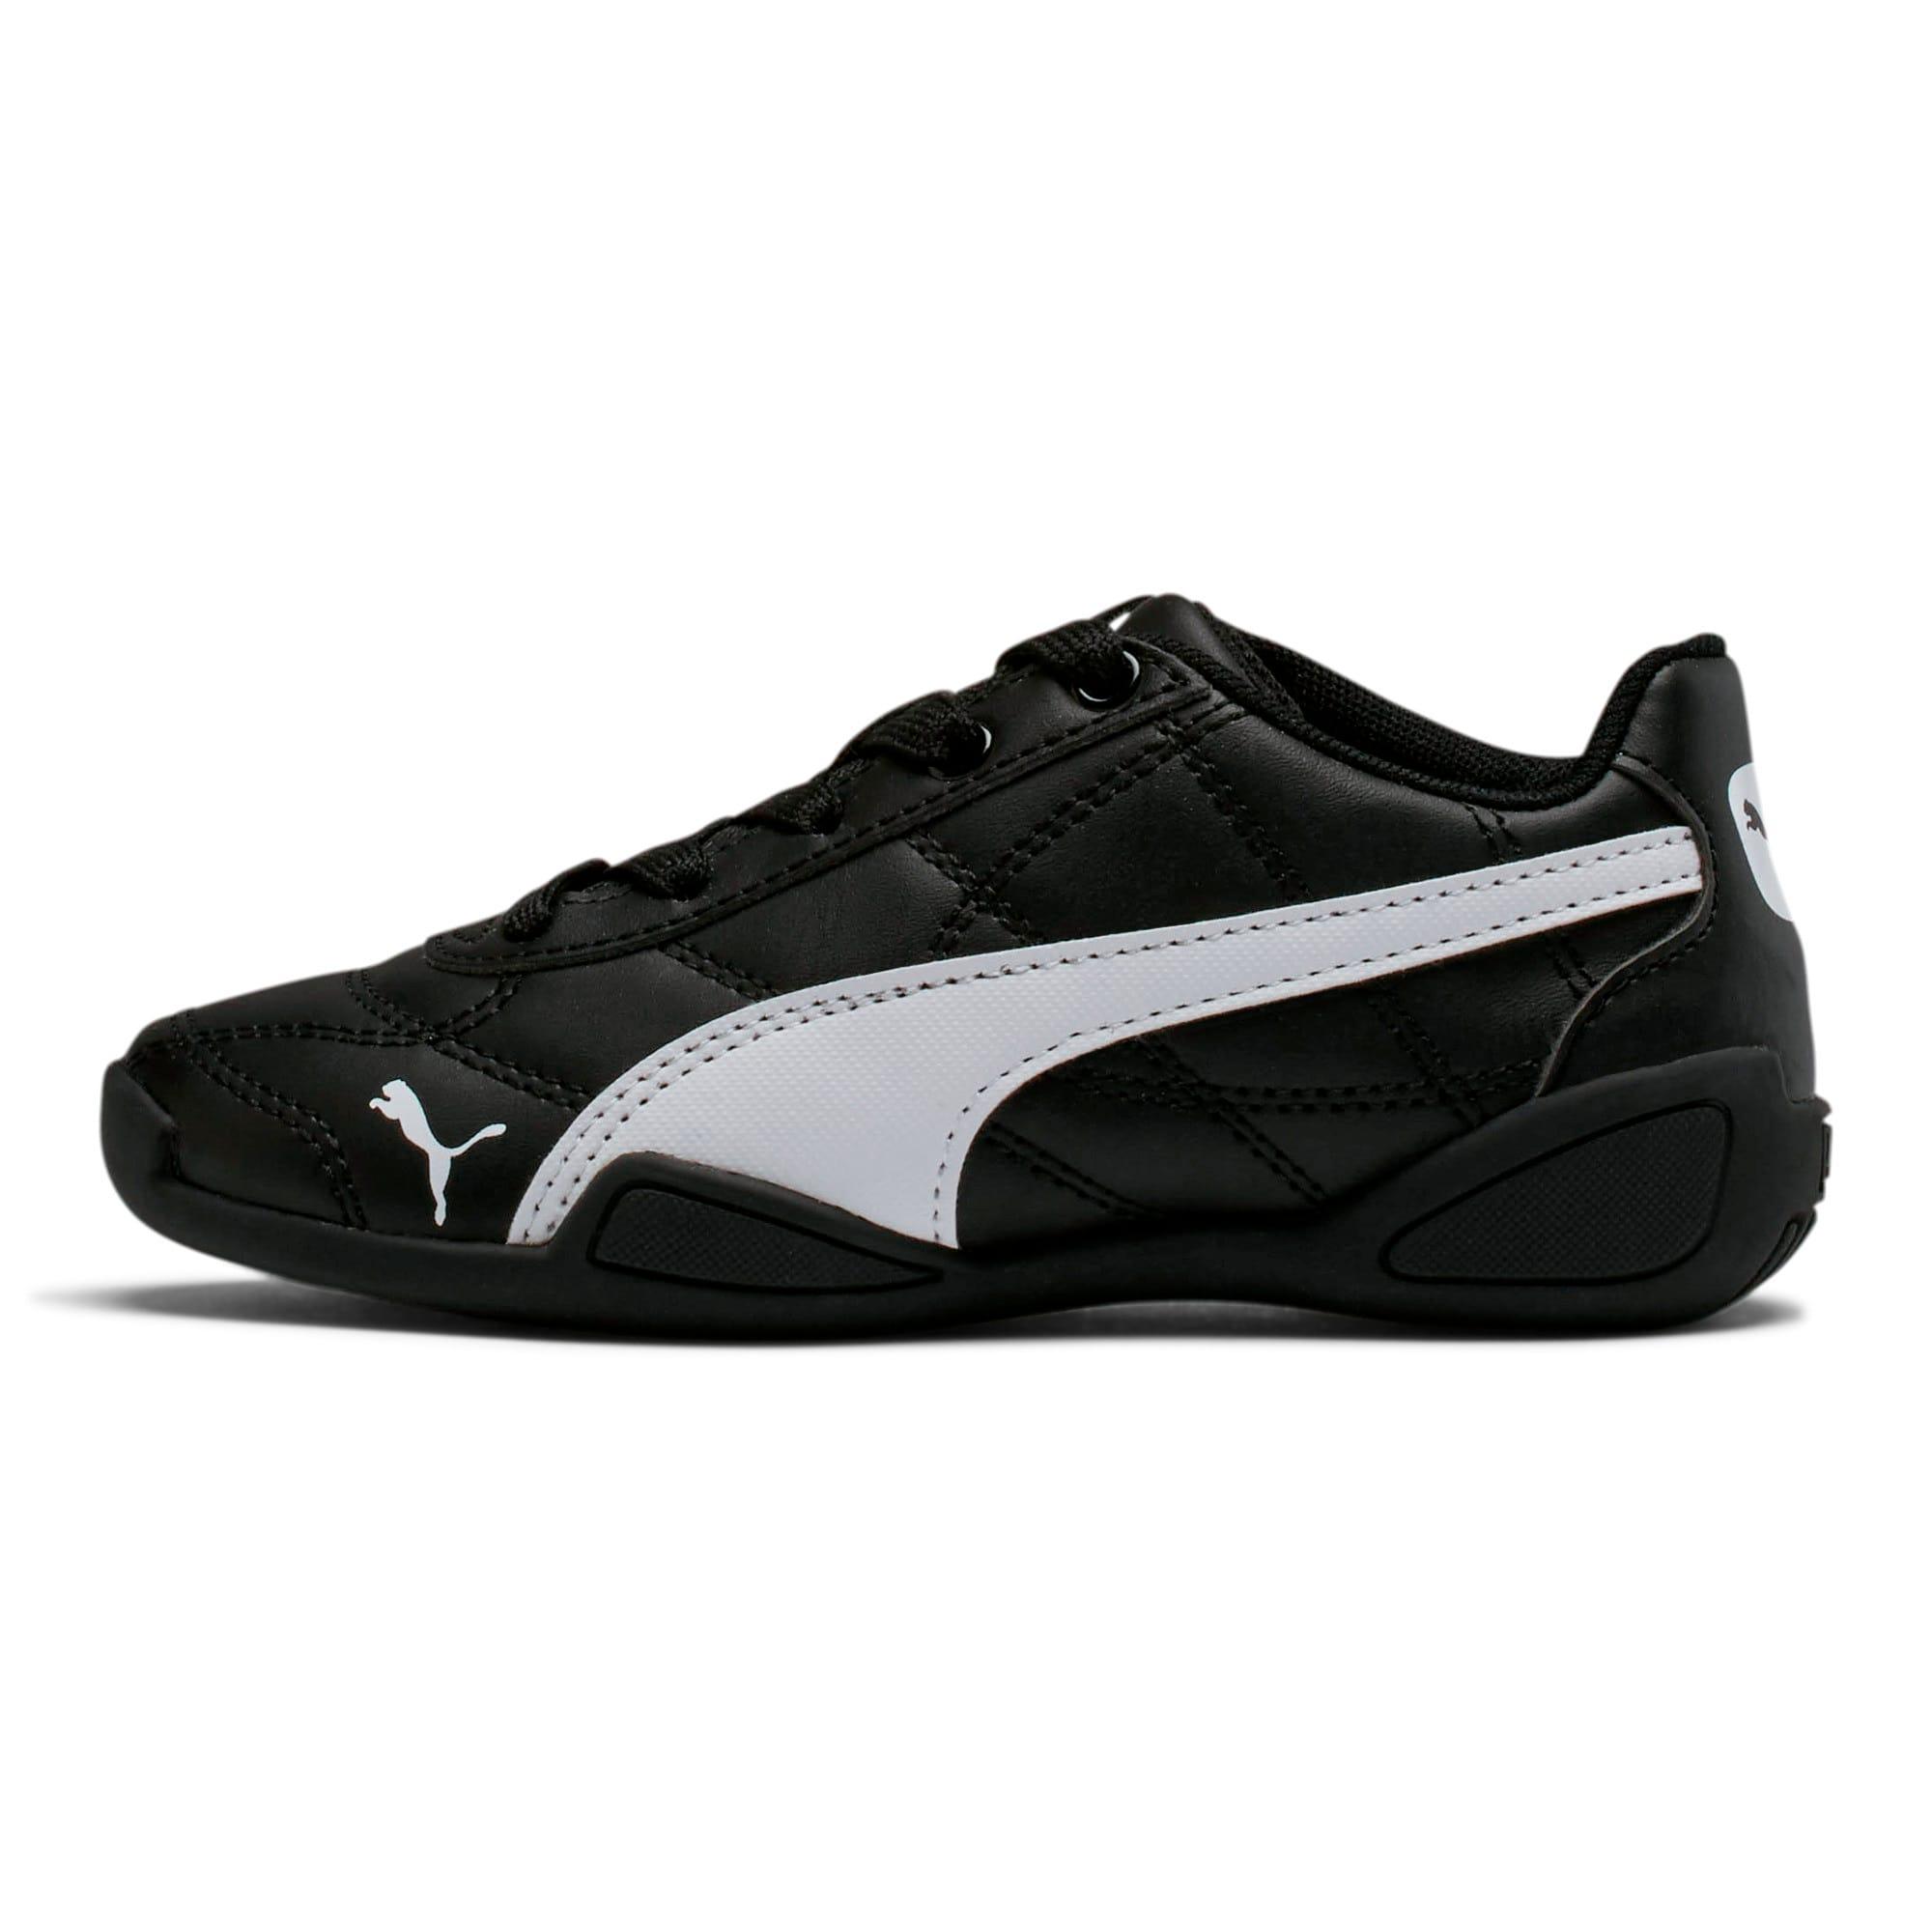 Thumbnail 1 of Tune Cat 3 Little Kids' Shoes, Puma Black-Puma White, medium